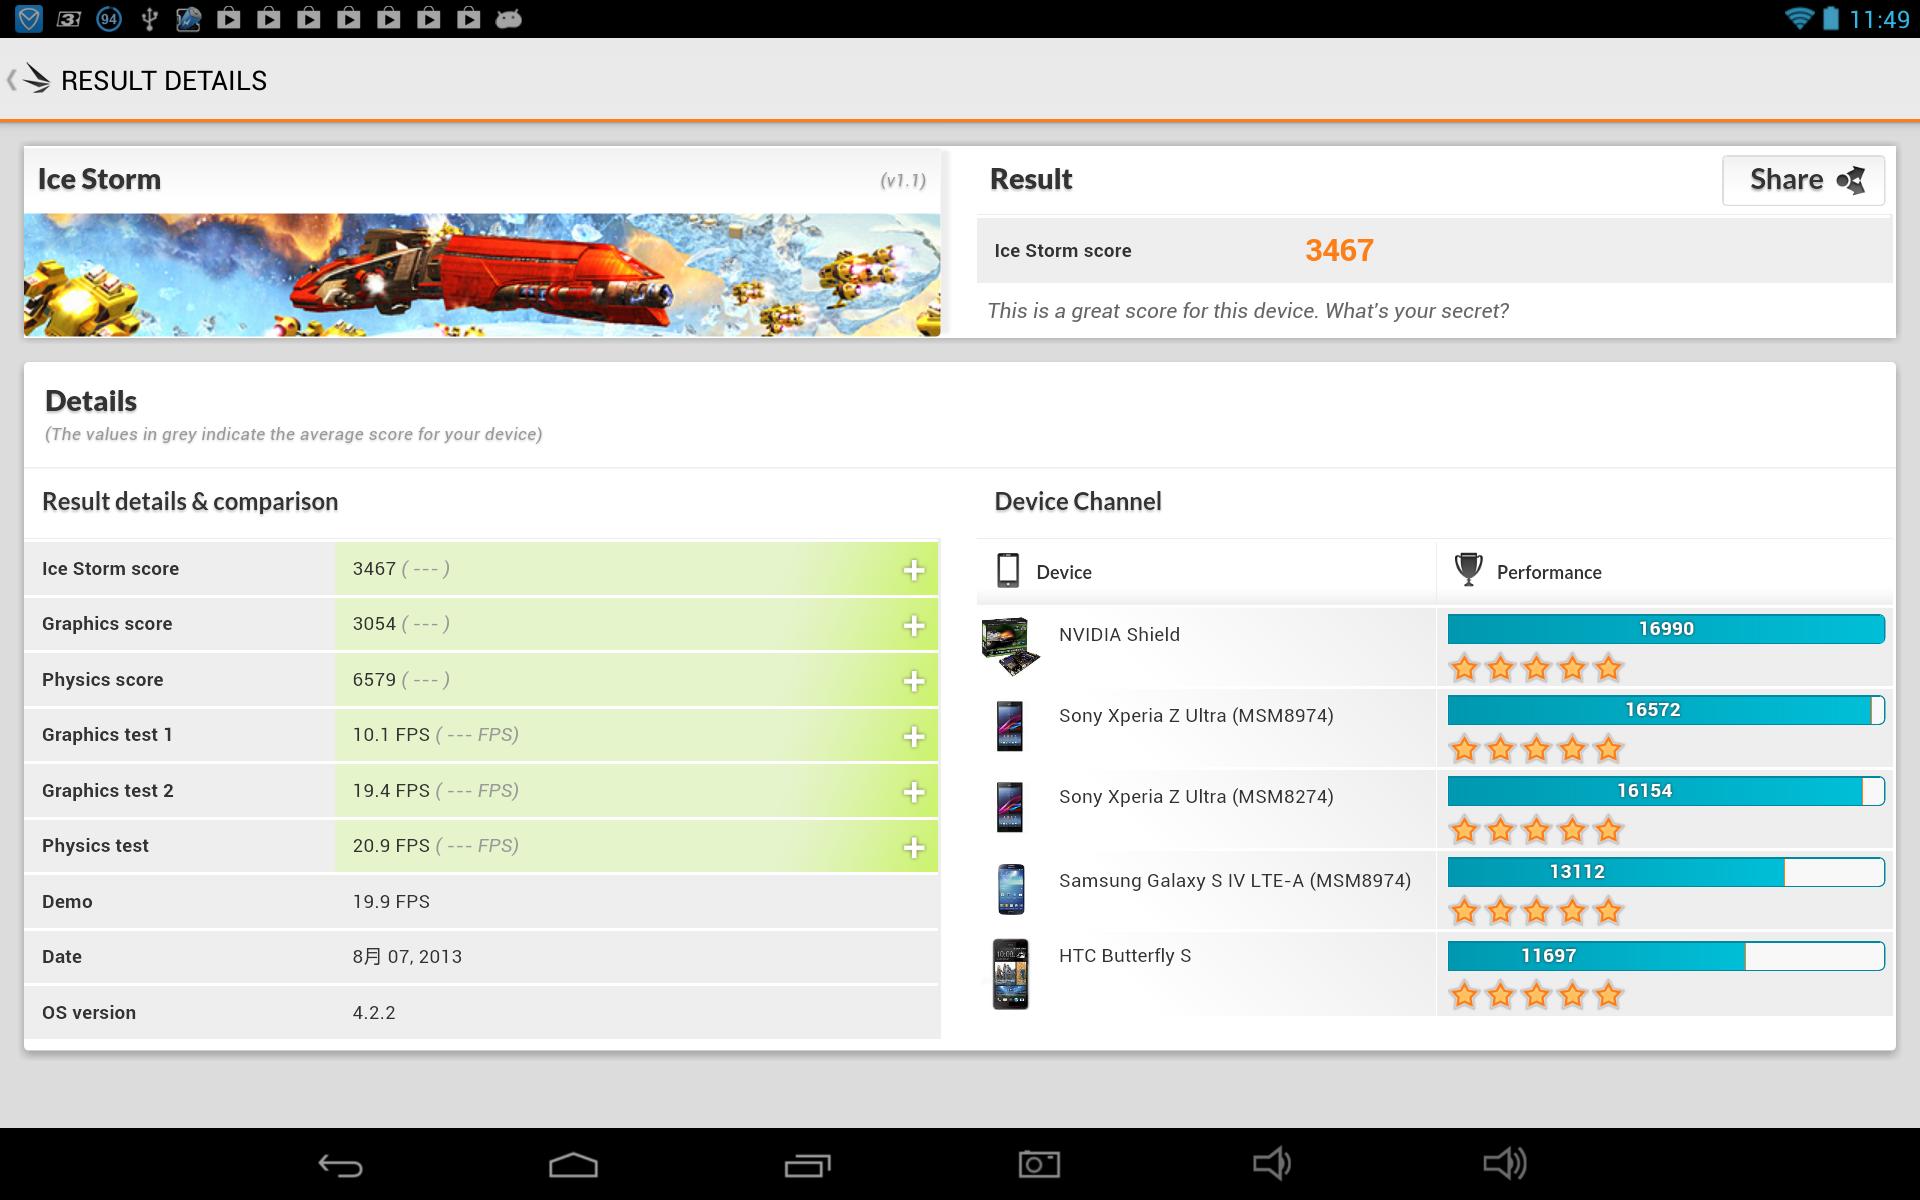 Screenshot_2013-08-07-11-49-21.png